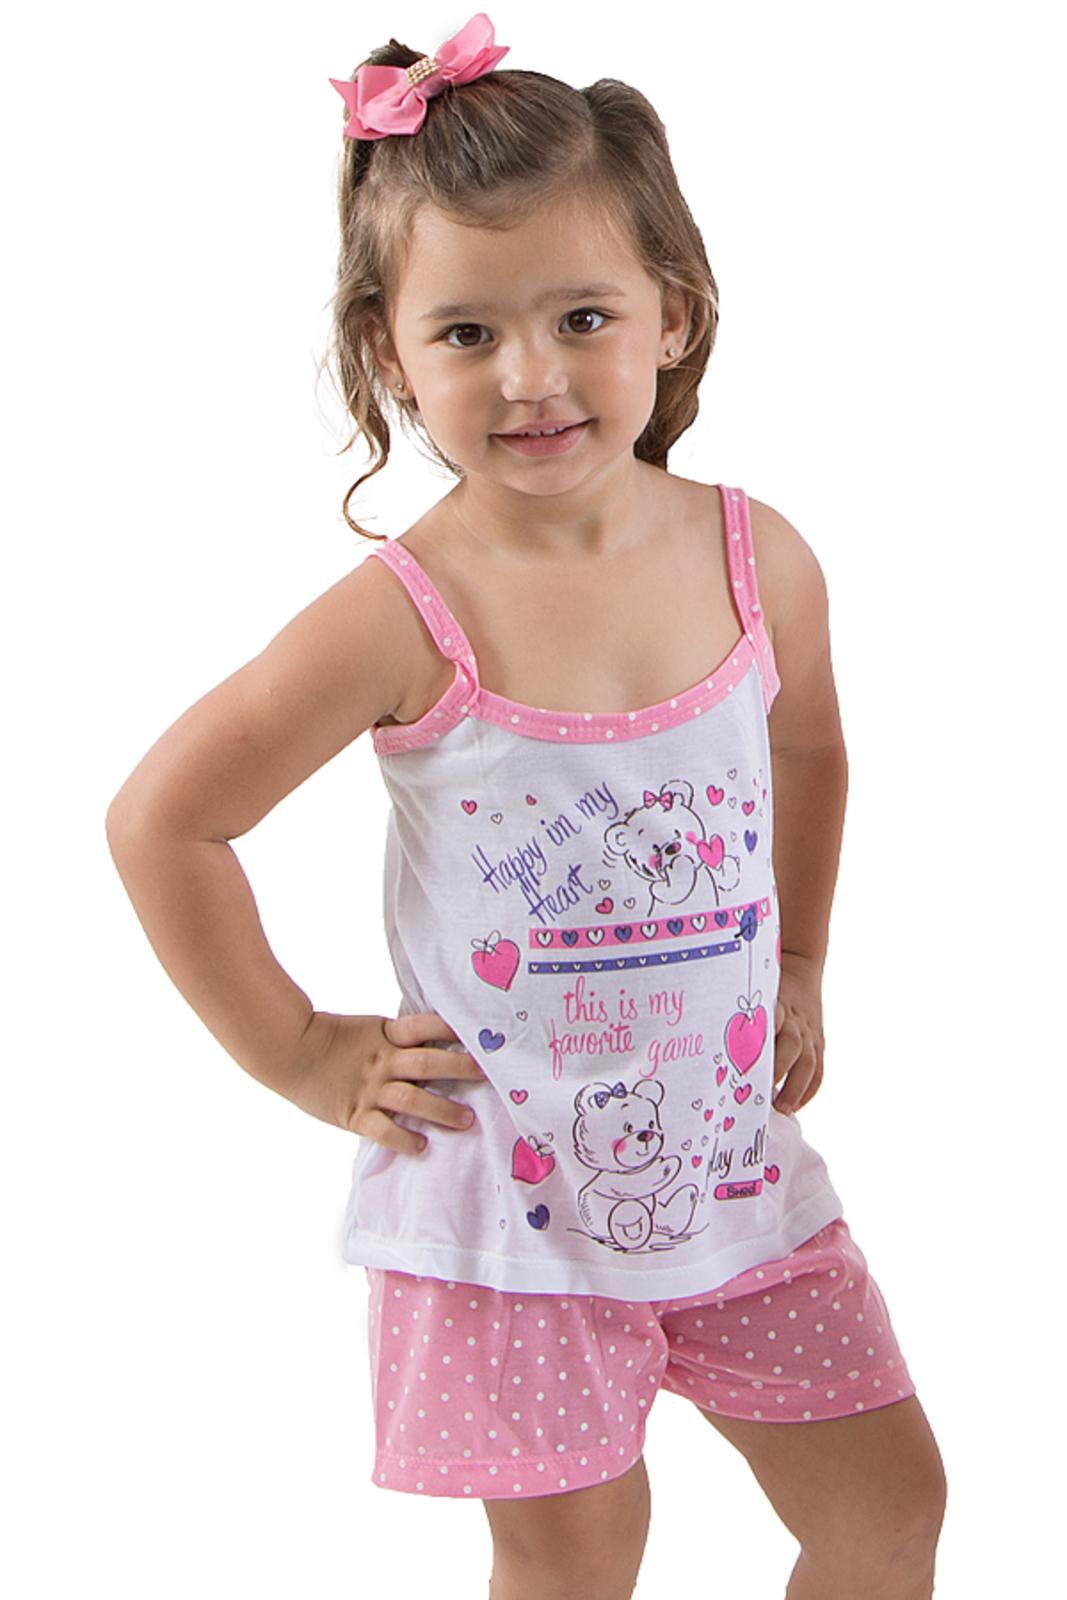 702ff8ab59fd34 Baby Doll Linha Noite Tal mãe Tal Filha (Filha) Rosa | Products ...